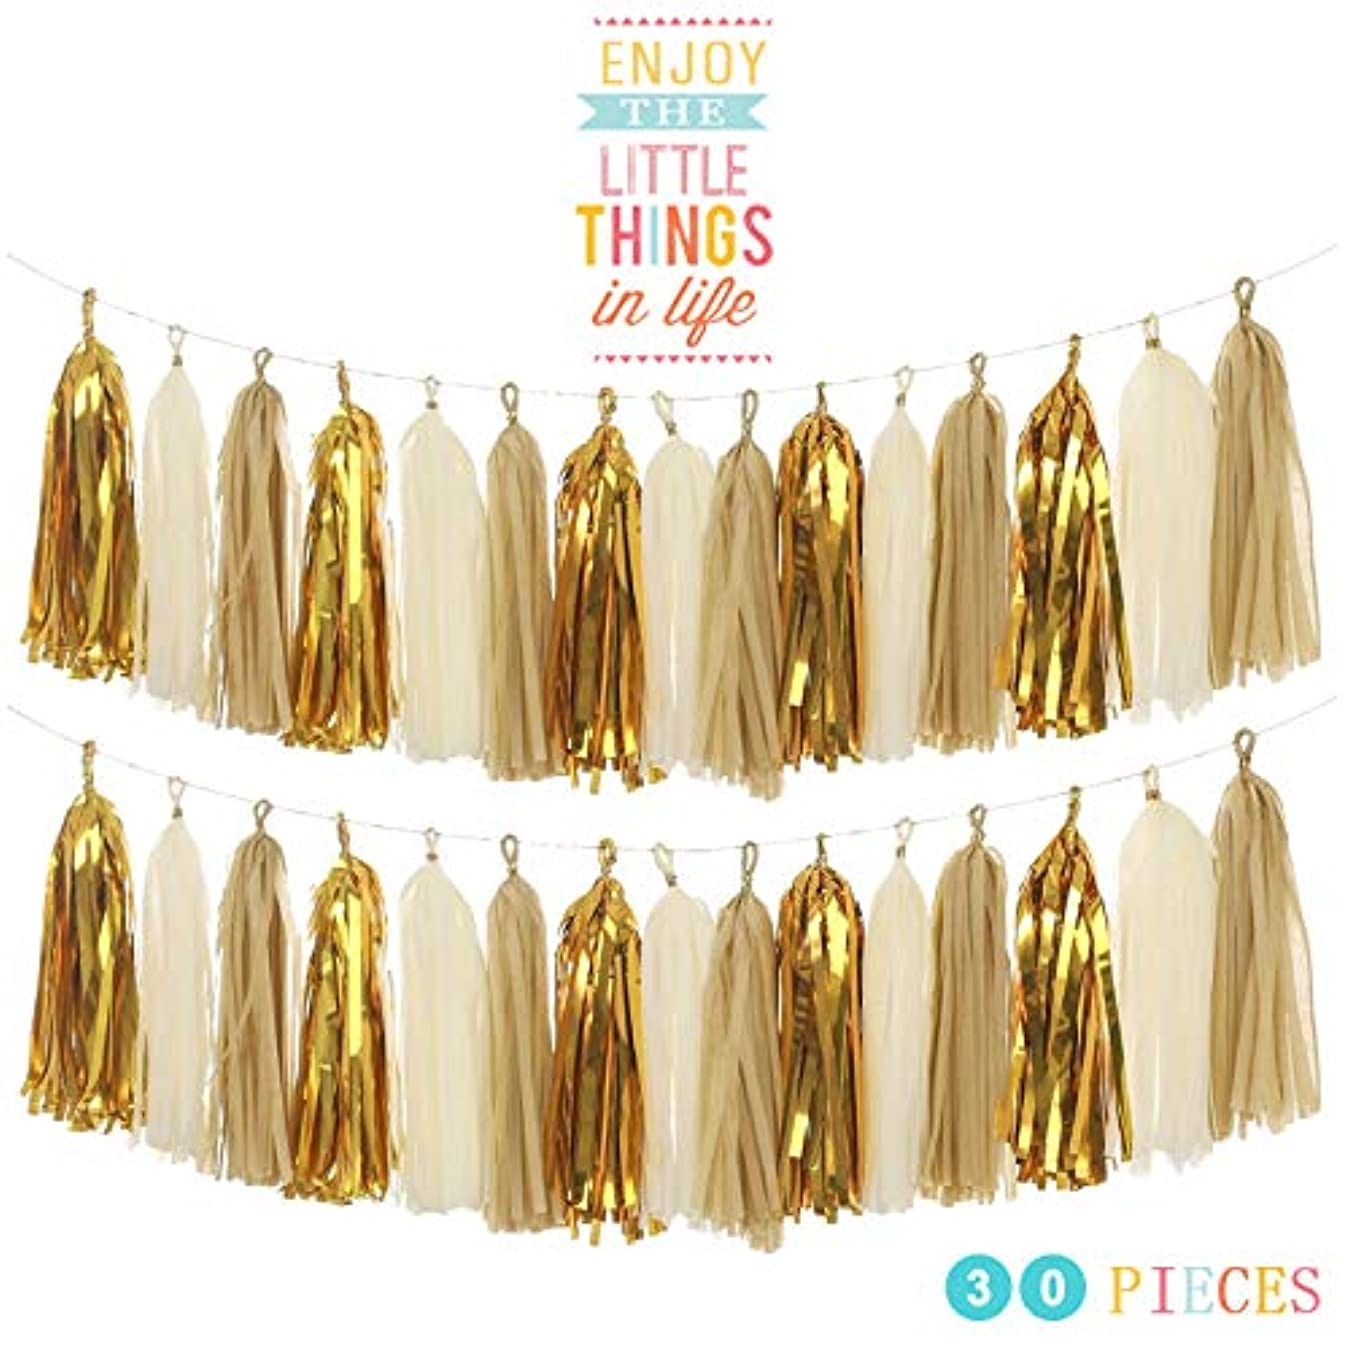 MerryNine Tissue Tassels Garlands, 30PCS Tassels, 14 Inch Long Tassels, for Wedding, Baby Shower, Event & Party Supplies Decoration (Tan/Ivory/Gold Set)